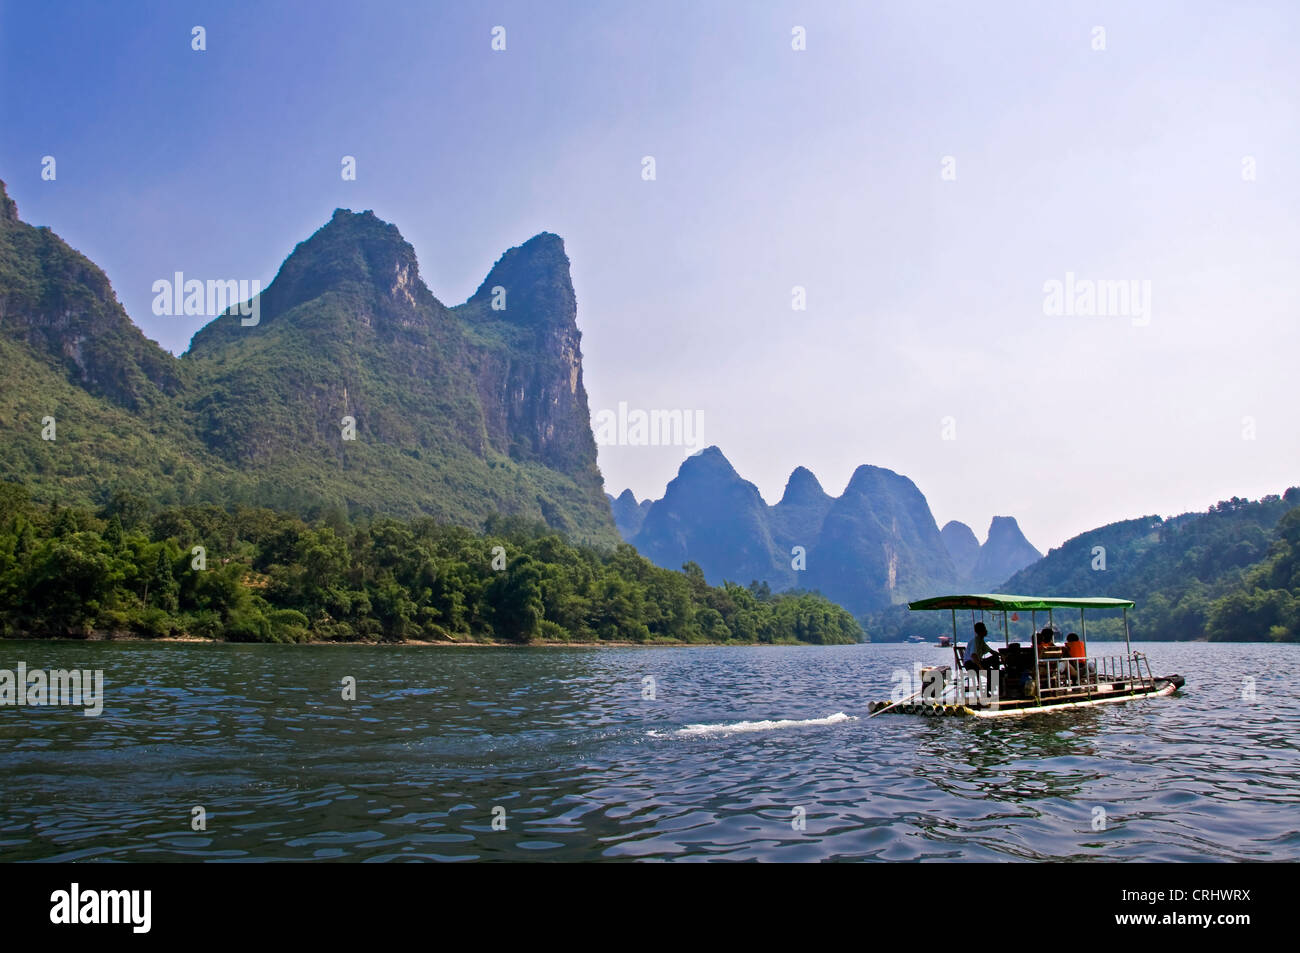 A boat on Li river between Guilin and  Yangshuo, Guangxi province - China Stock Photo